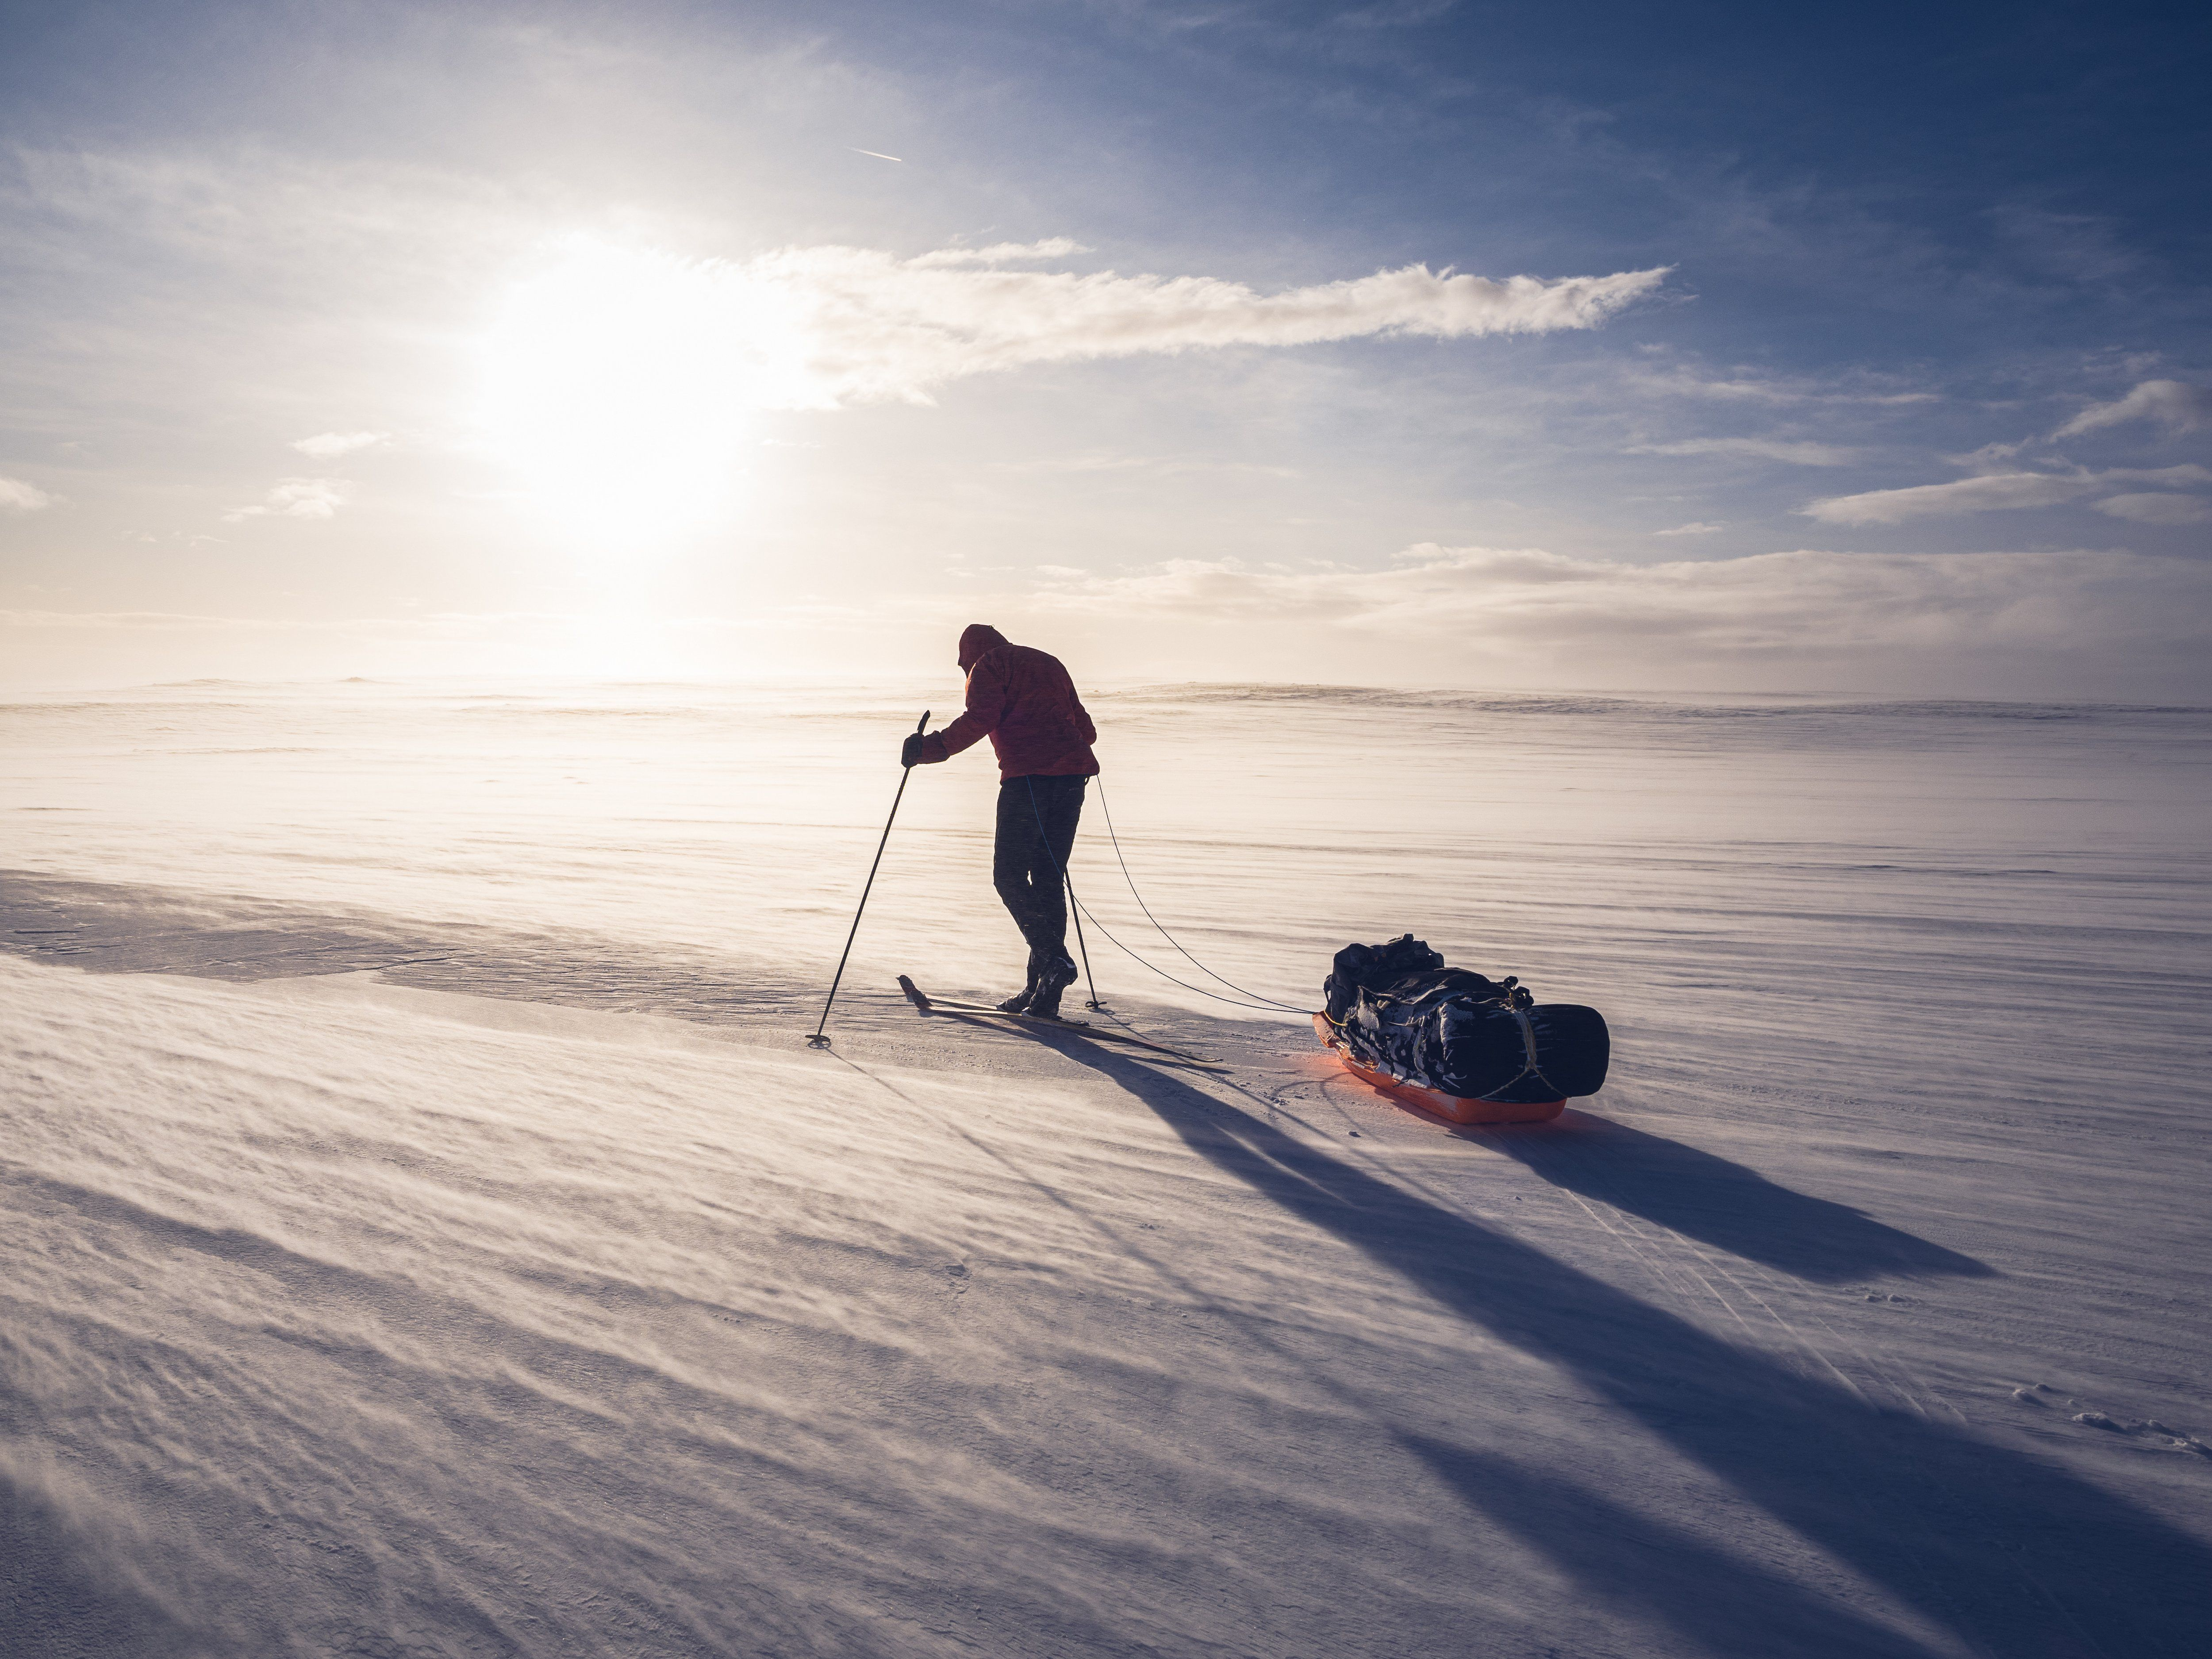 La traversée hivernale de l'Islande | Łukasz Supergan